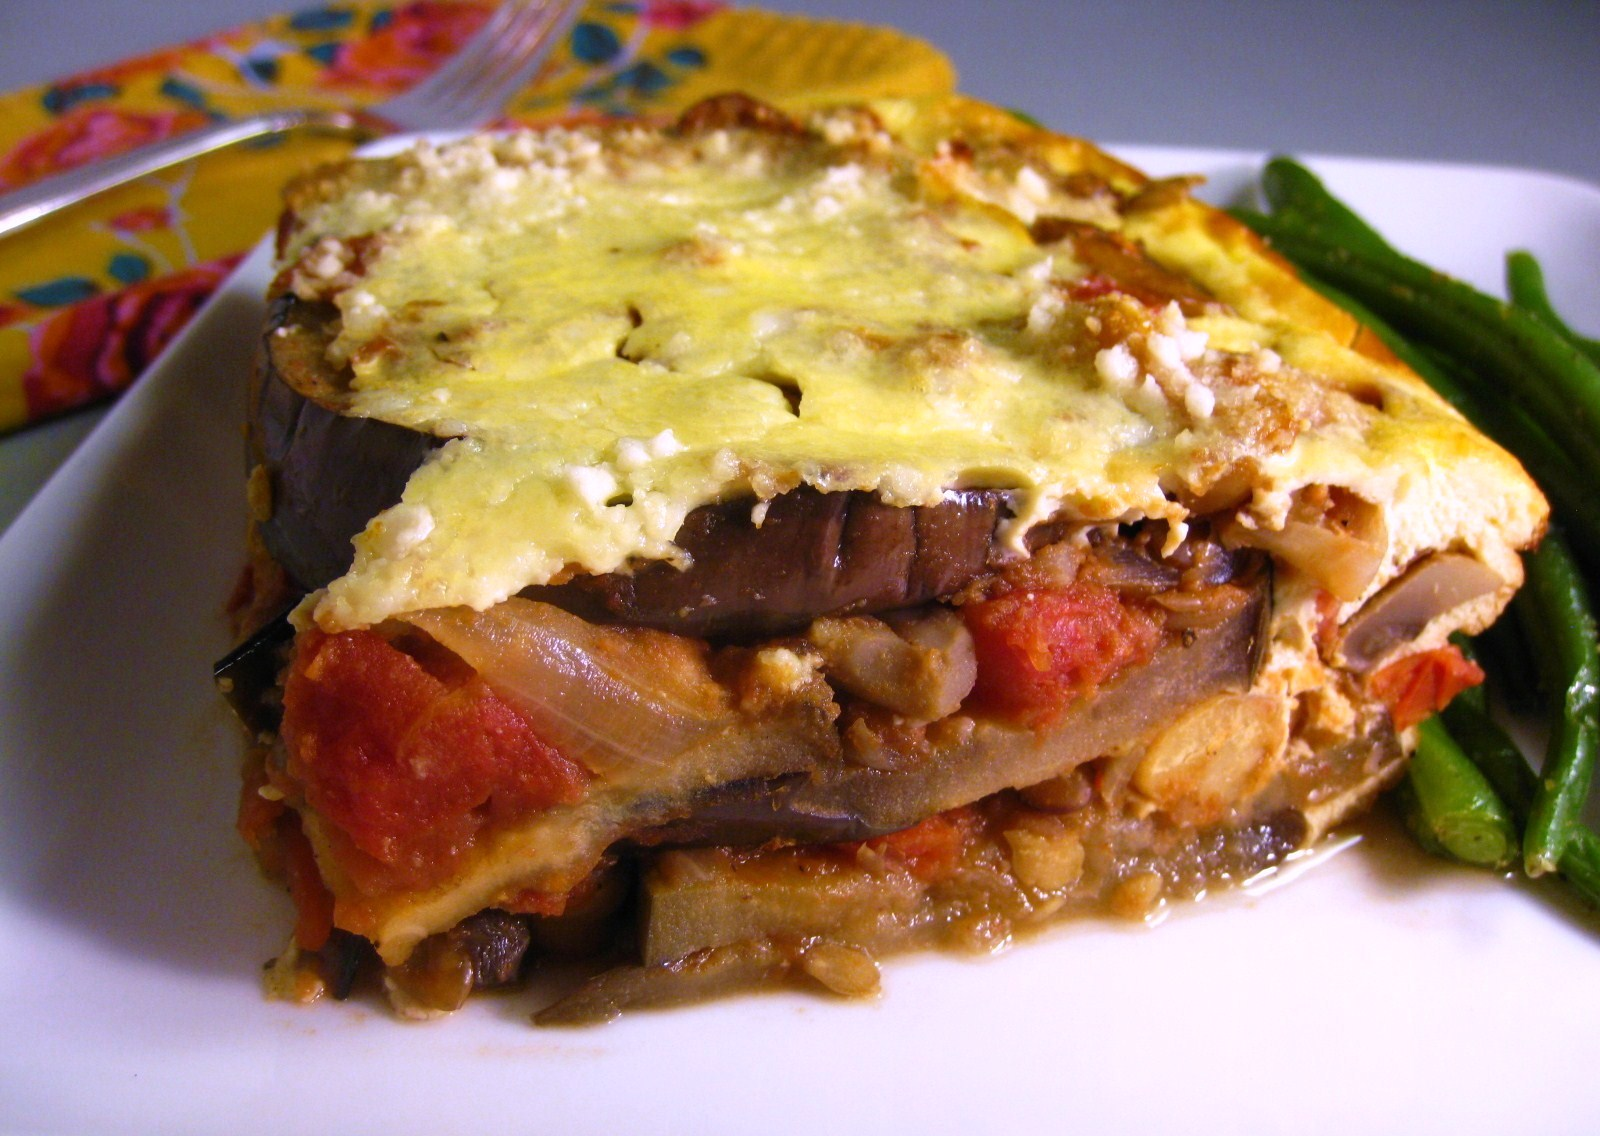 Cara's Cravings » Lentil & Eggplant Moussaka